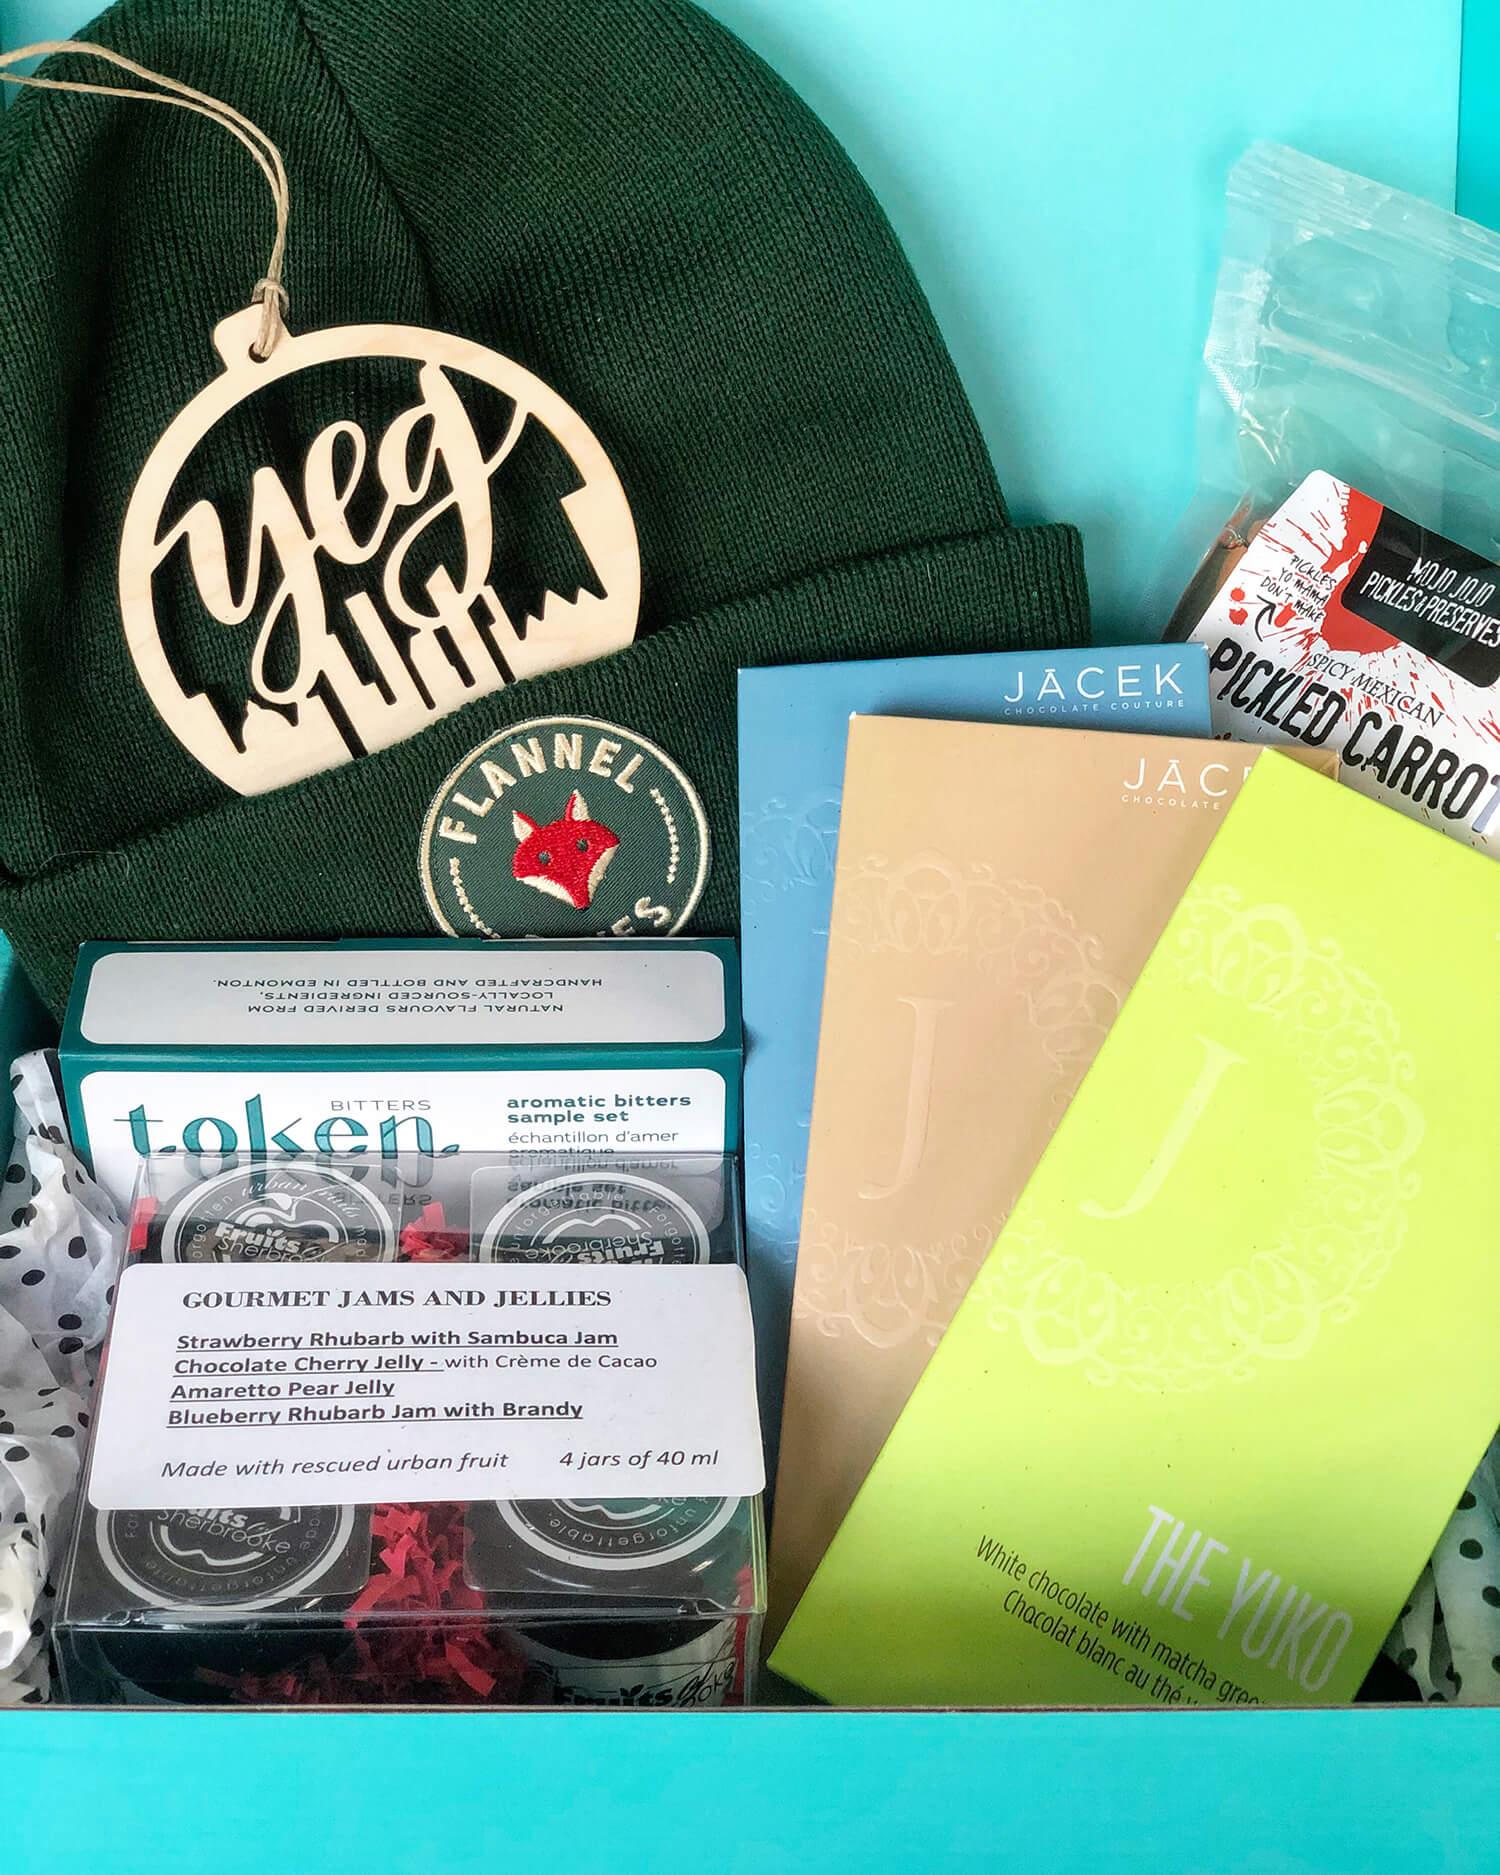 Edmonton Made Gifted Catalogue Taste of YEG Box